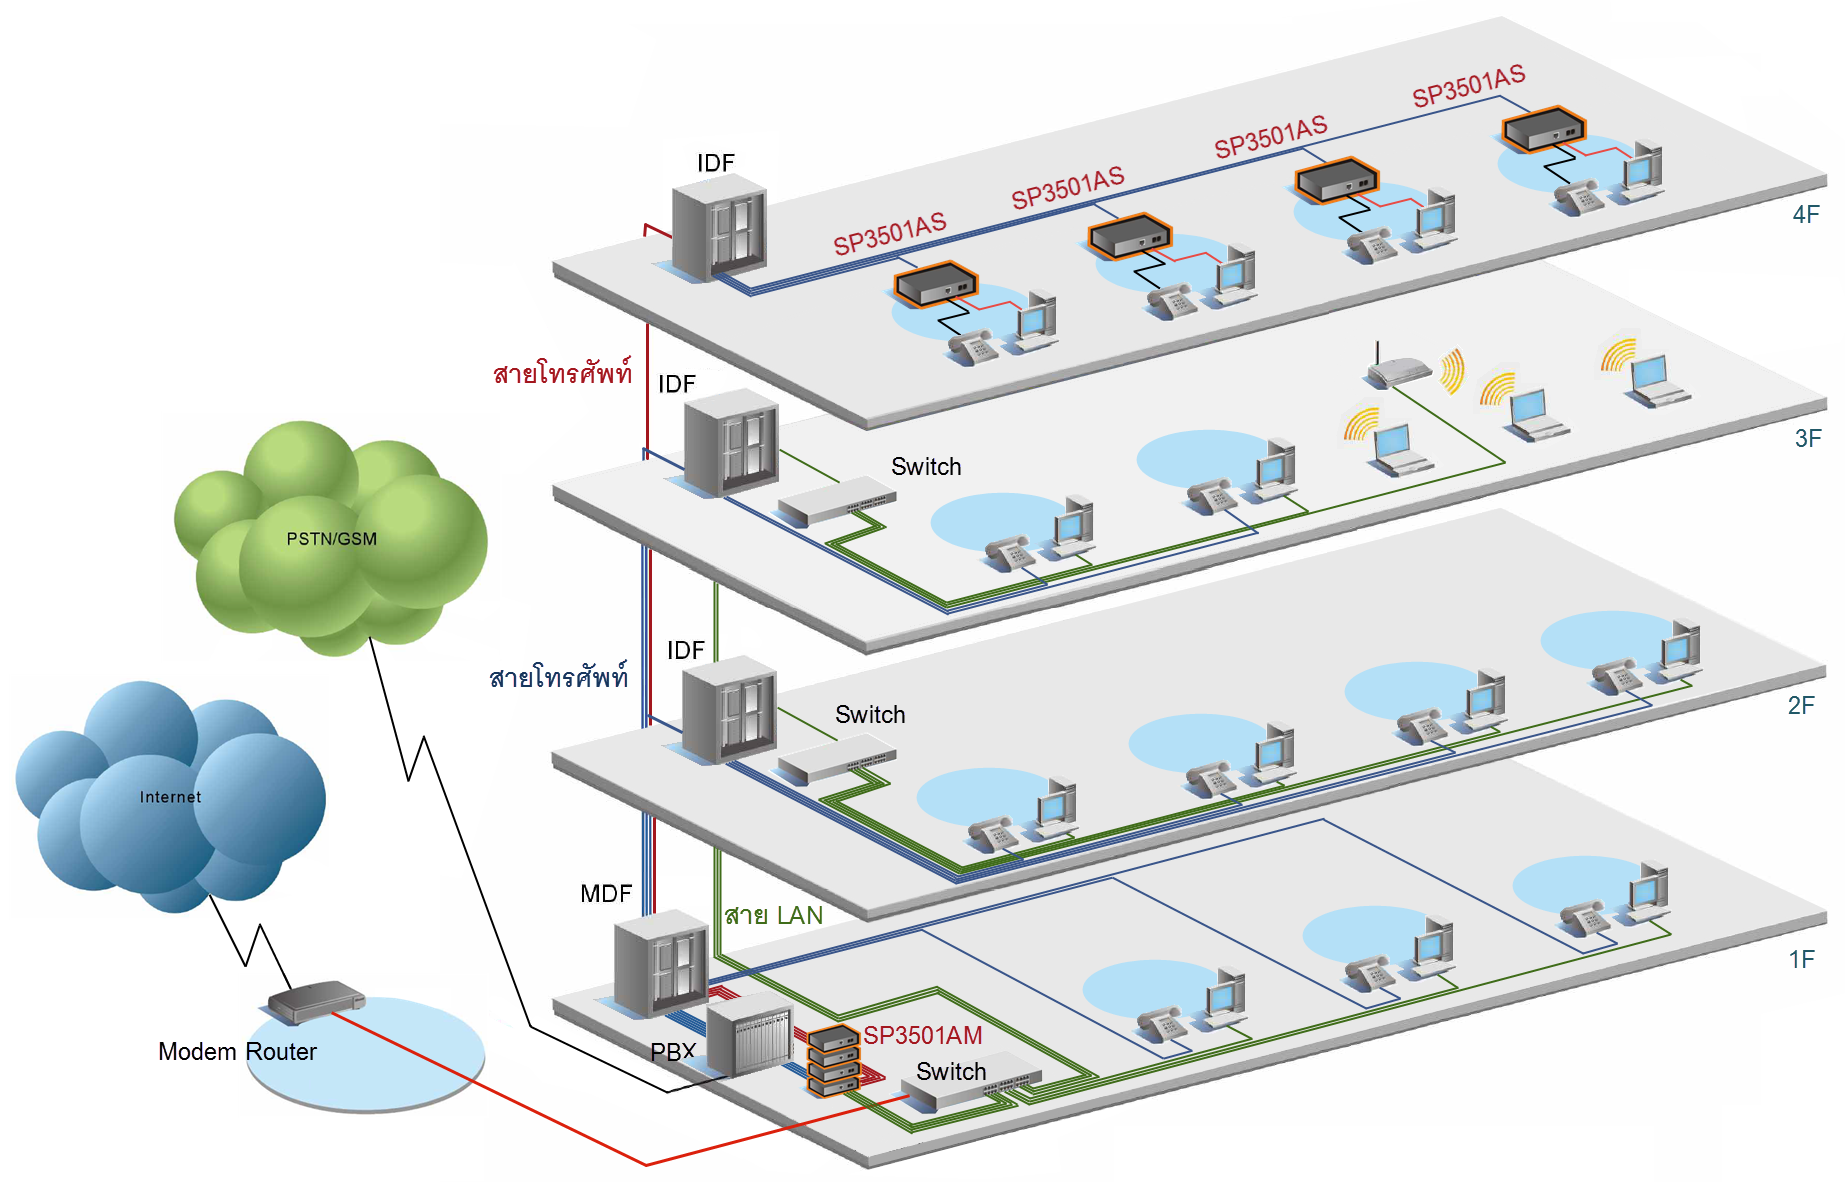 Micronet SP3501AM/AS VDSL CO/CPE Modem Extender เชื่อมต่อเครือข่ายผ่านสายโทรศัพท์